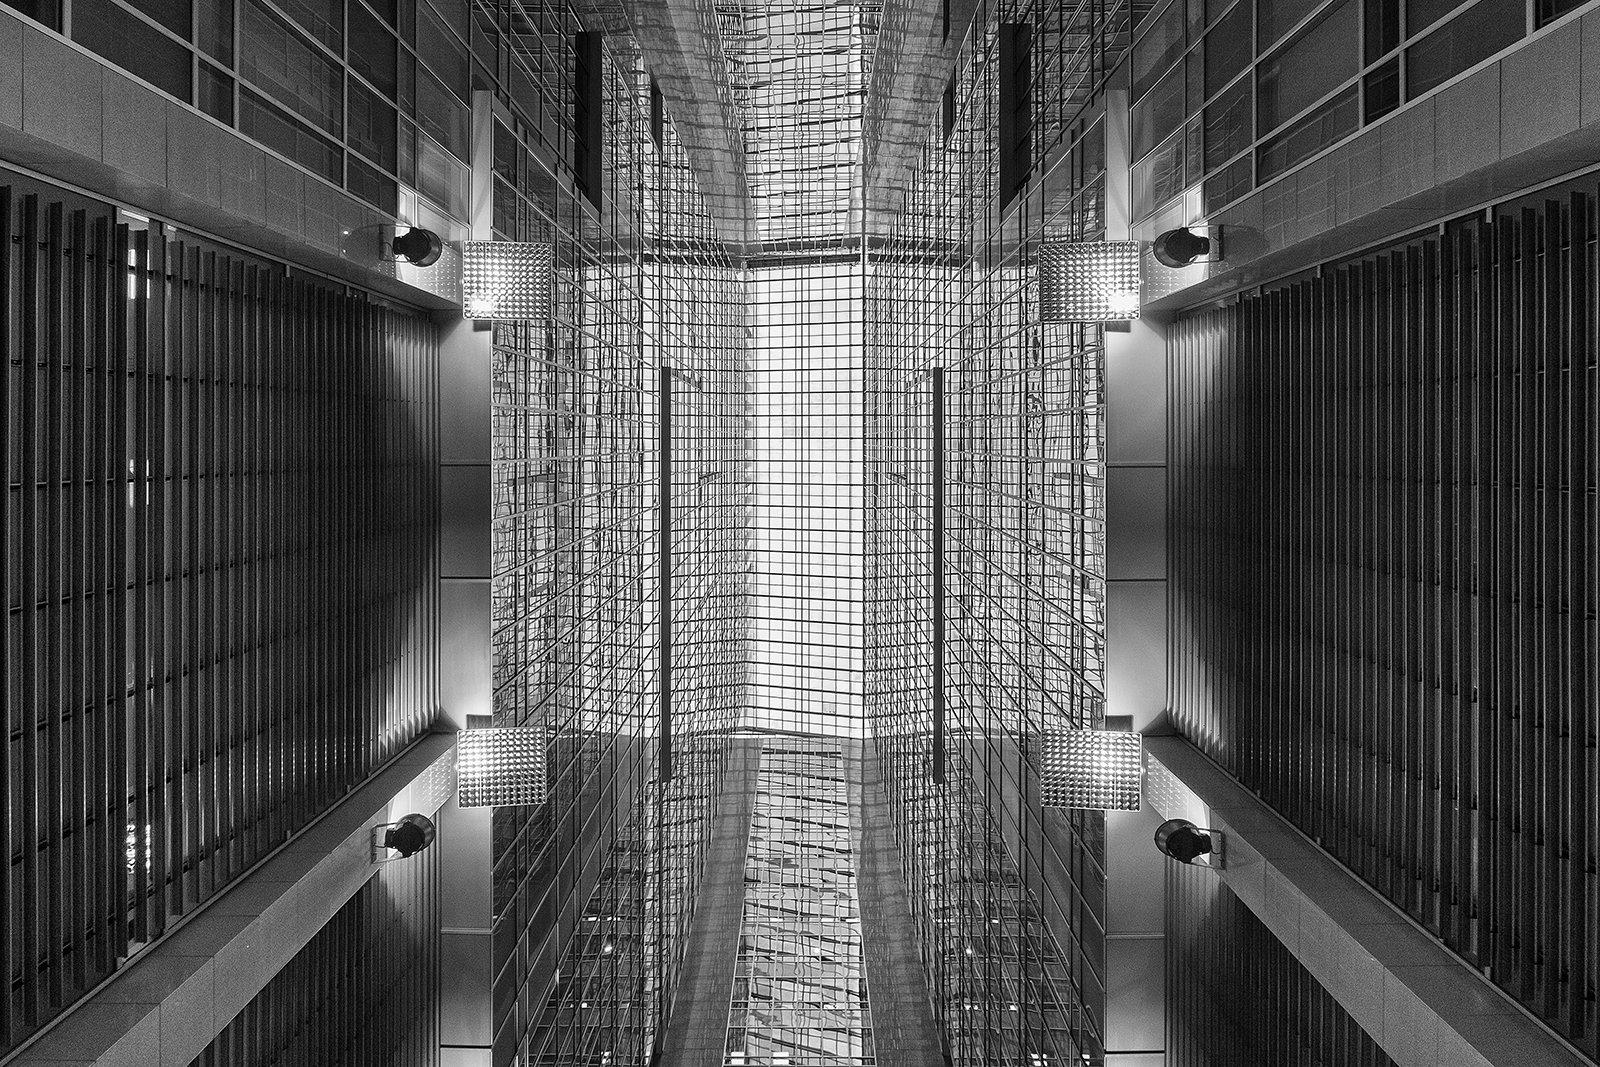 geometry art neverstopexploring прогулки по городу city moscow архитектурное фото architecture archirect building buildings arquitetura архитектура bw, Нина Богатырева